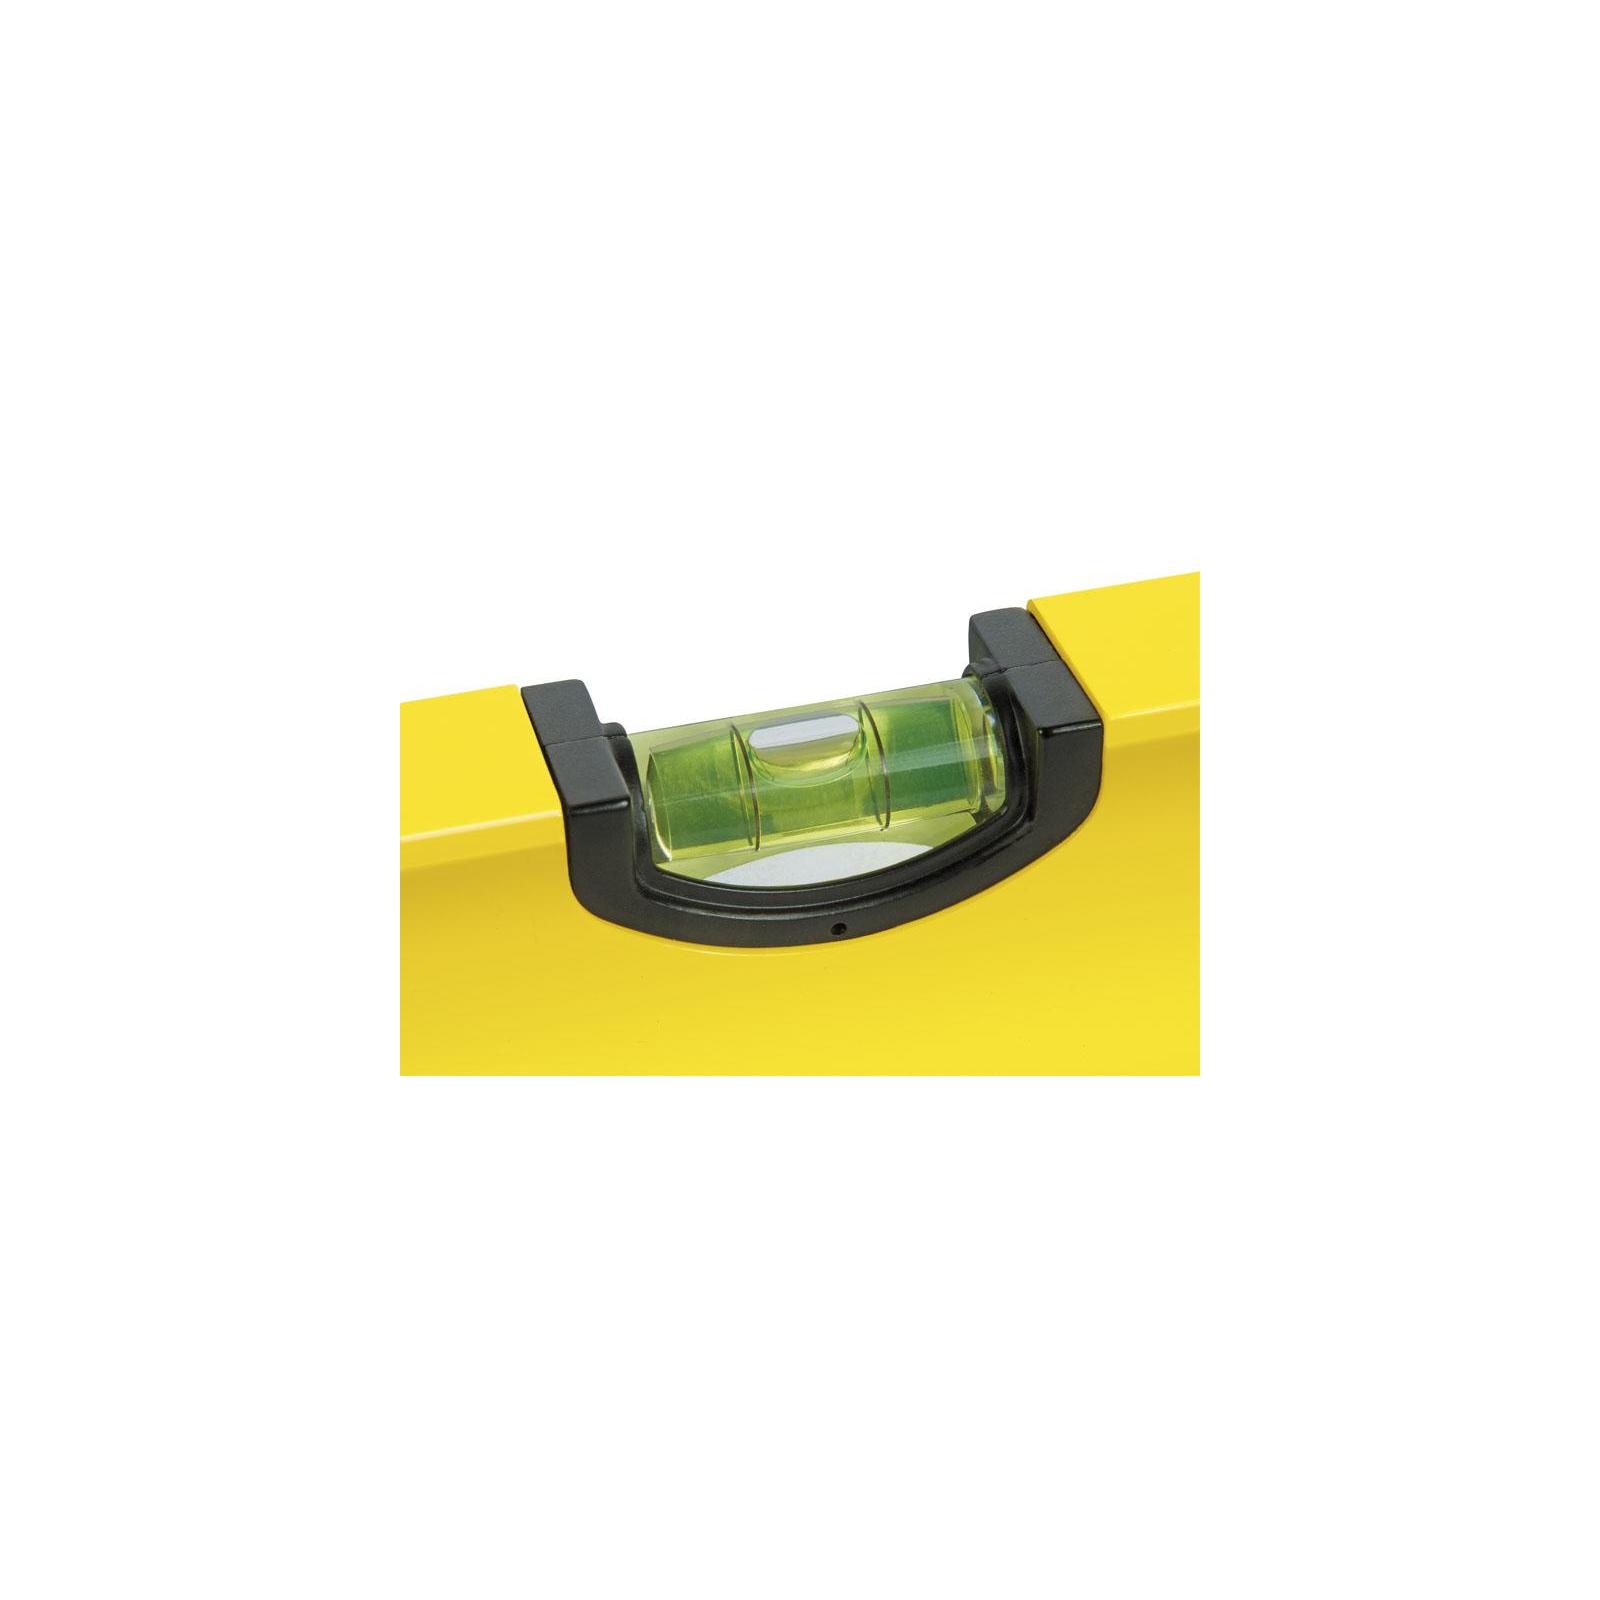 Уровень Stanley Classic Box Level L=400 мм (STHT1-43102) изображение 3